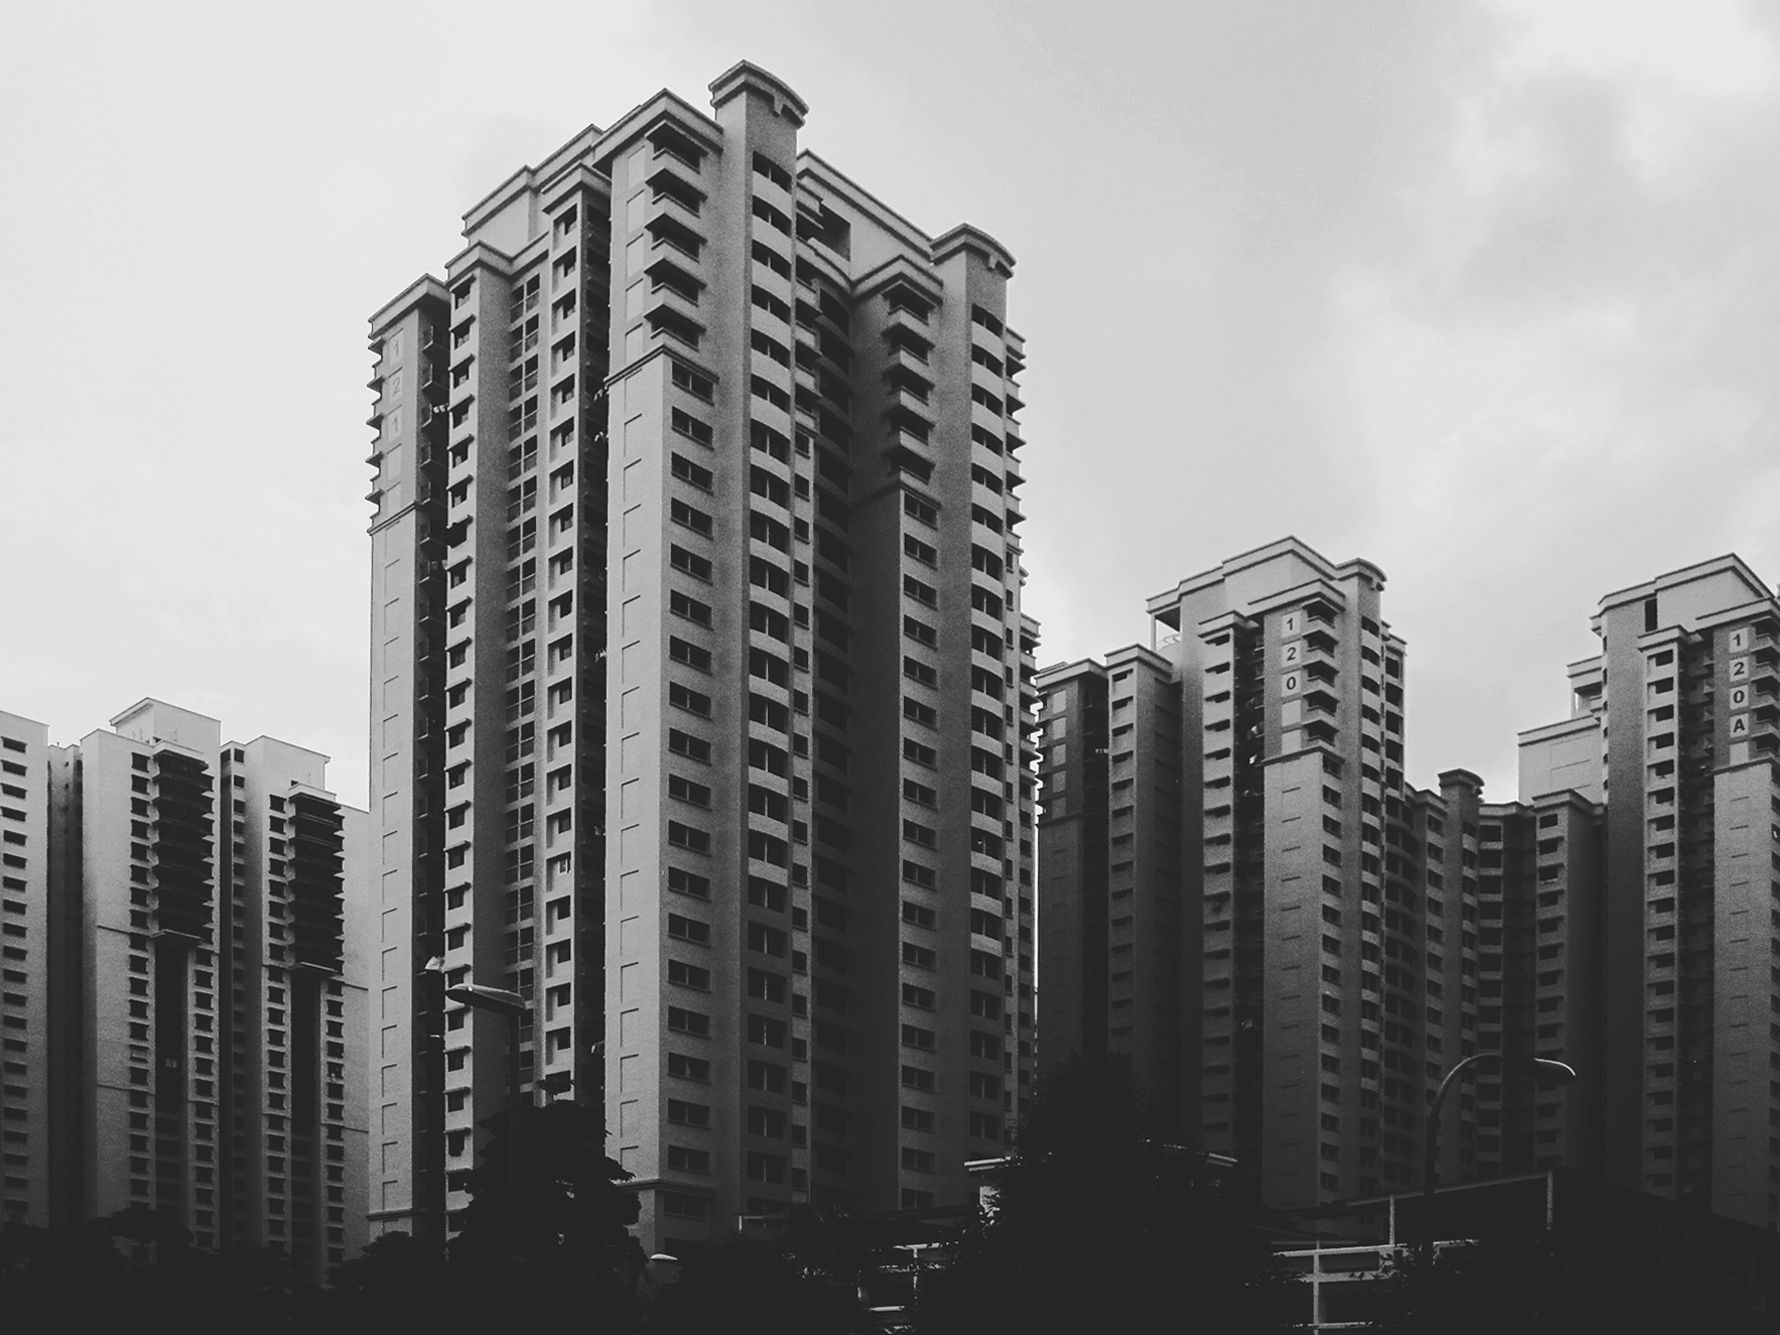 Singapore Bukit Merah Residential